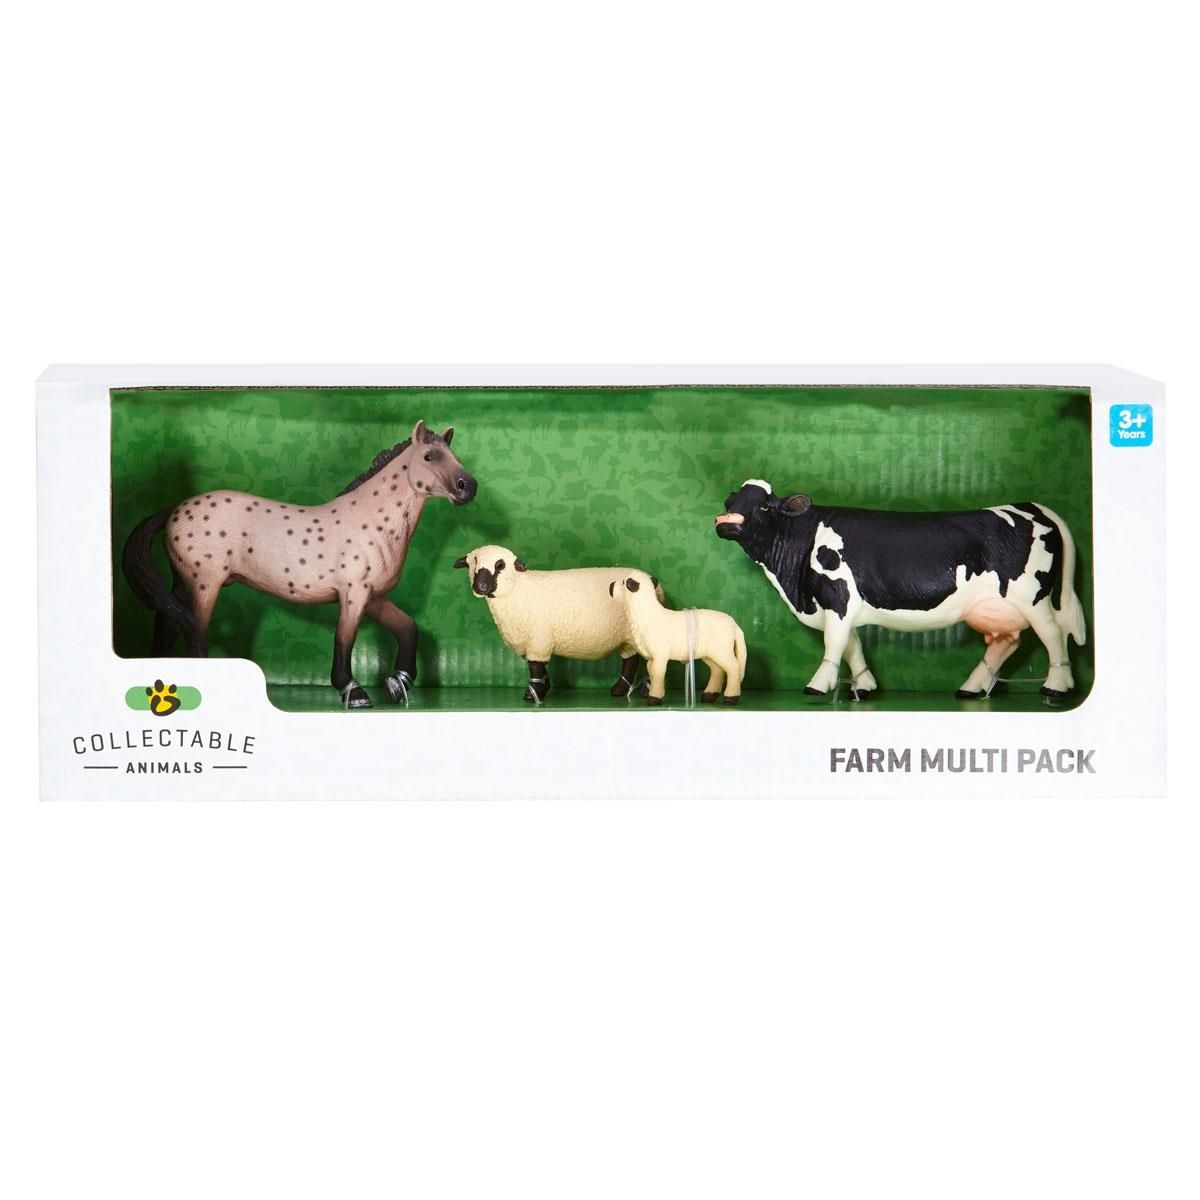 Farm Multi Pack Animals Yg93634 15 At Kmart Animals Farm